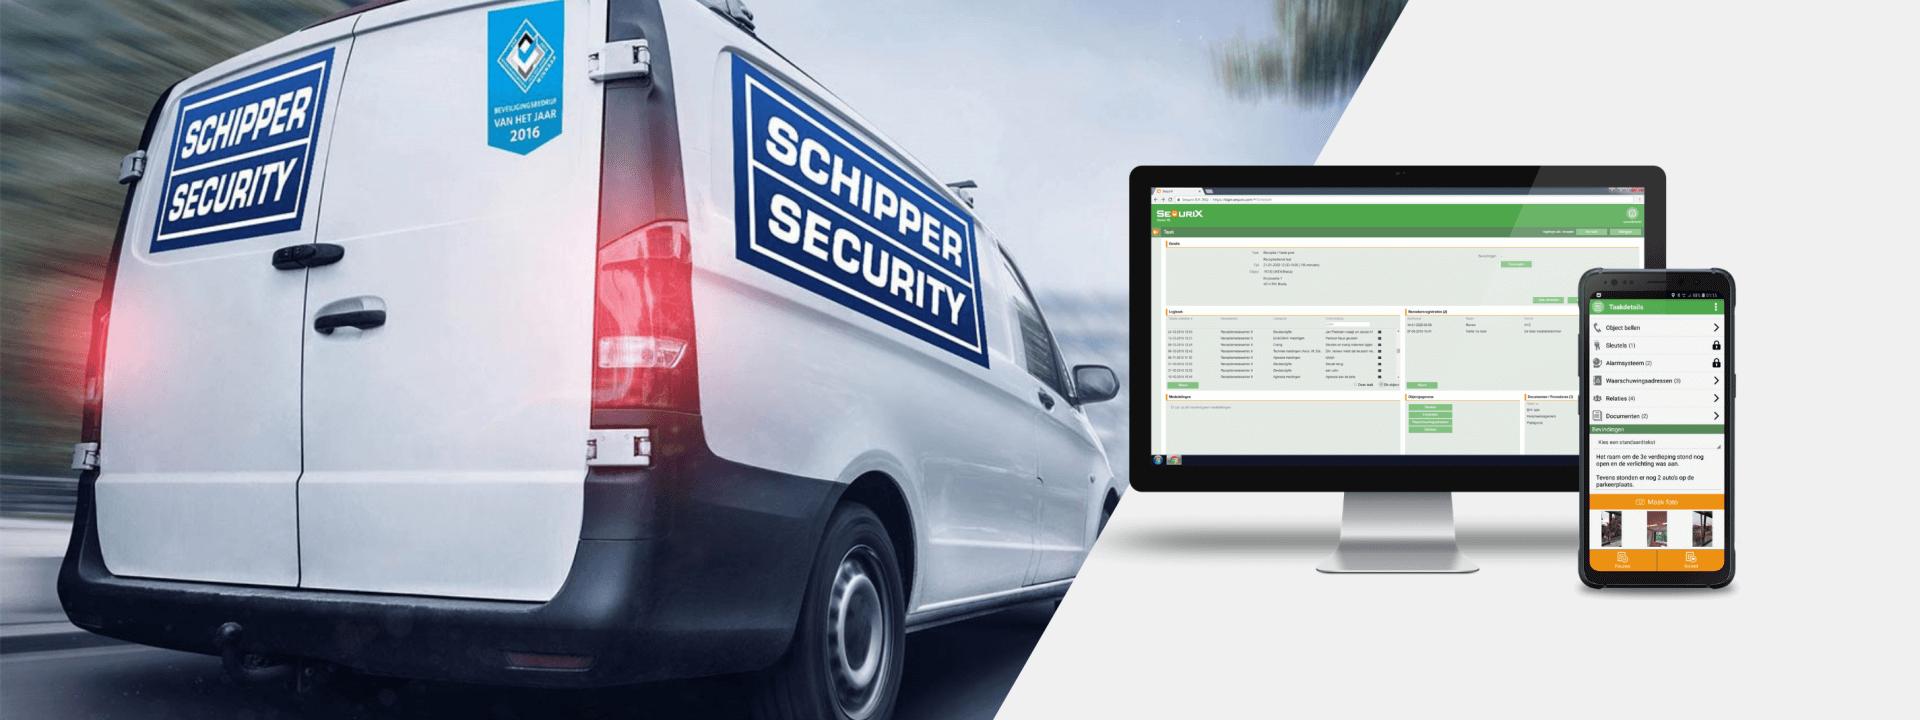 Schipper Security